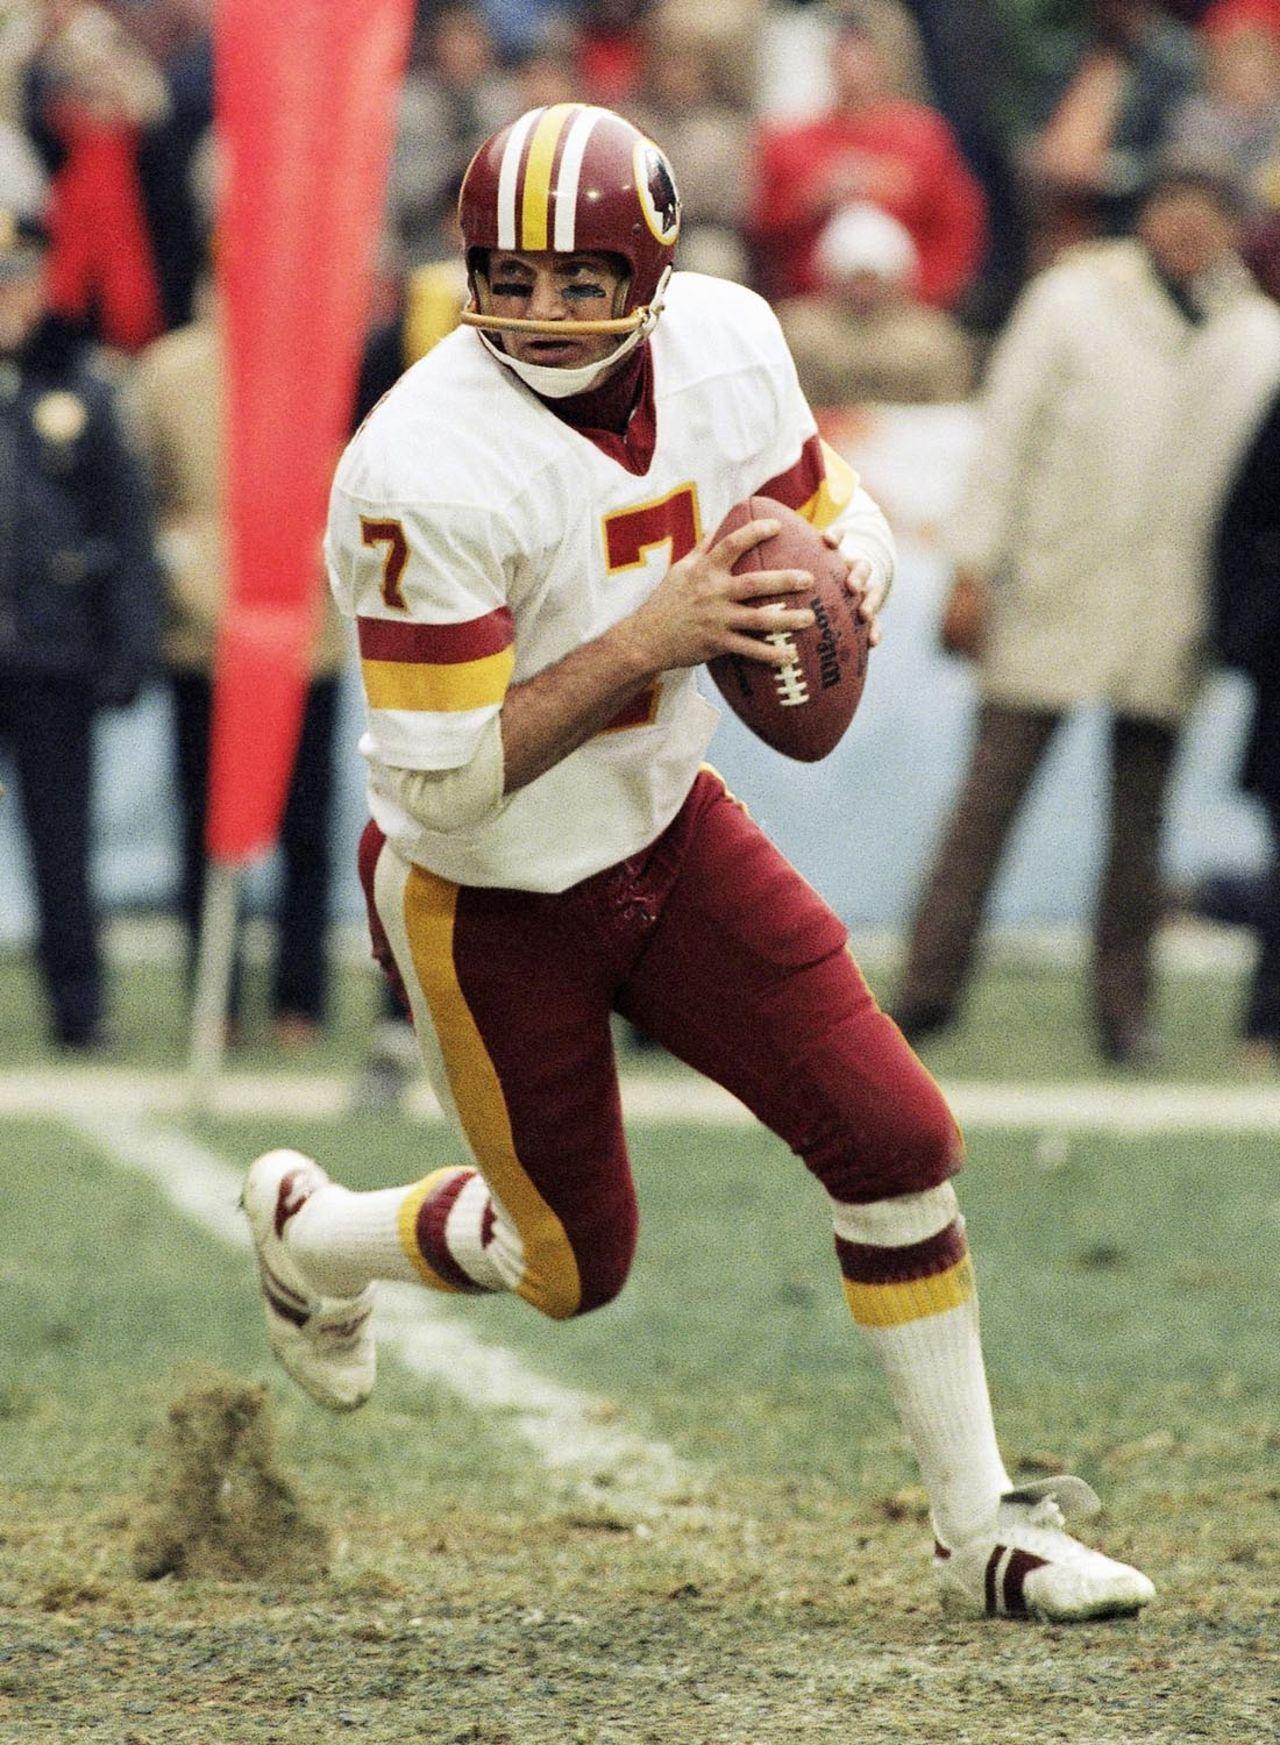 theismann kann helmet flirten bar joe jodel single ich  Cowboys Rate Theismann As Hot-Dog, Showboat - The Washington SPIN.